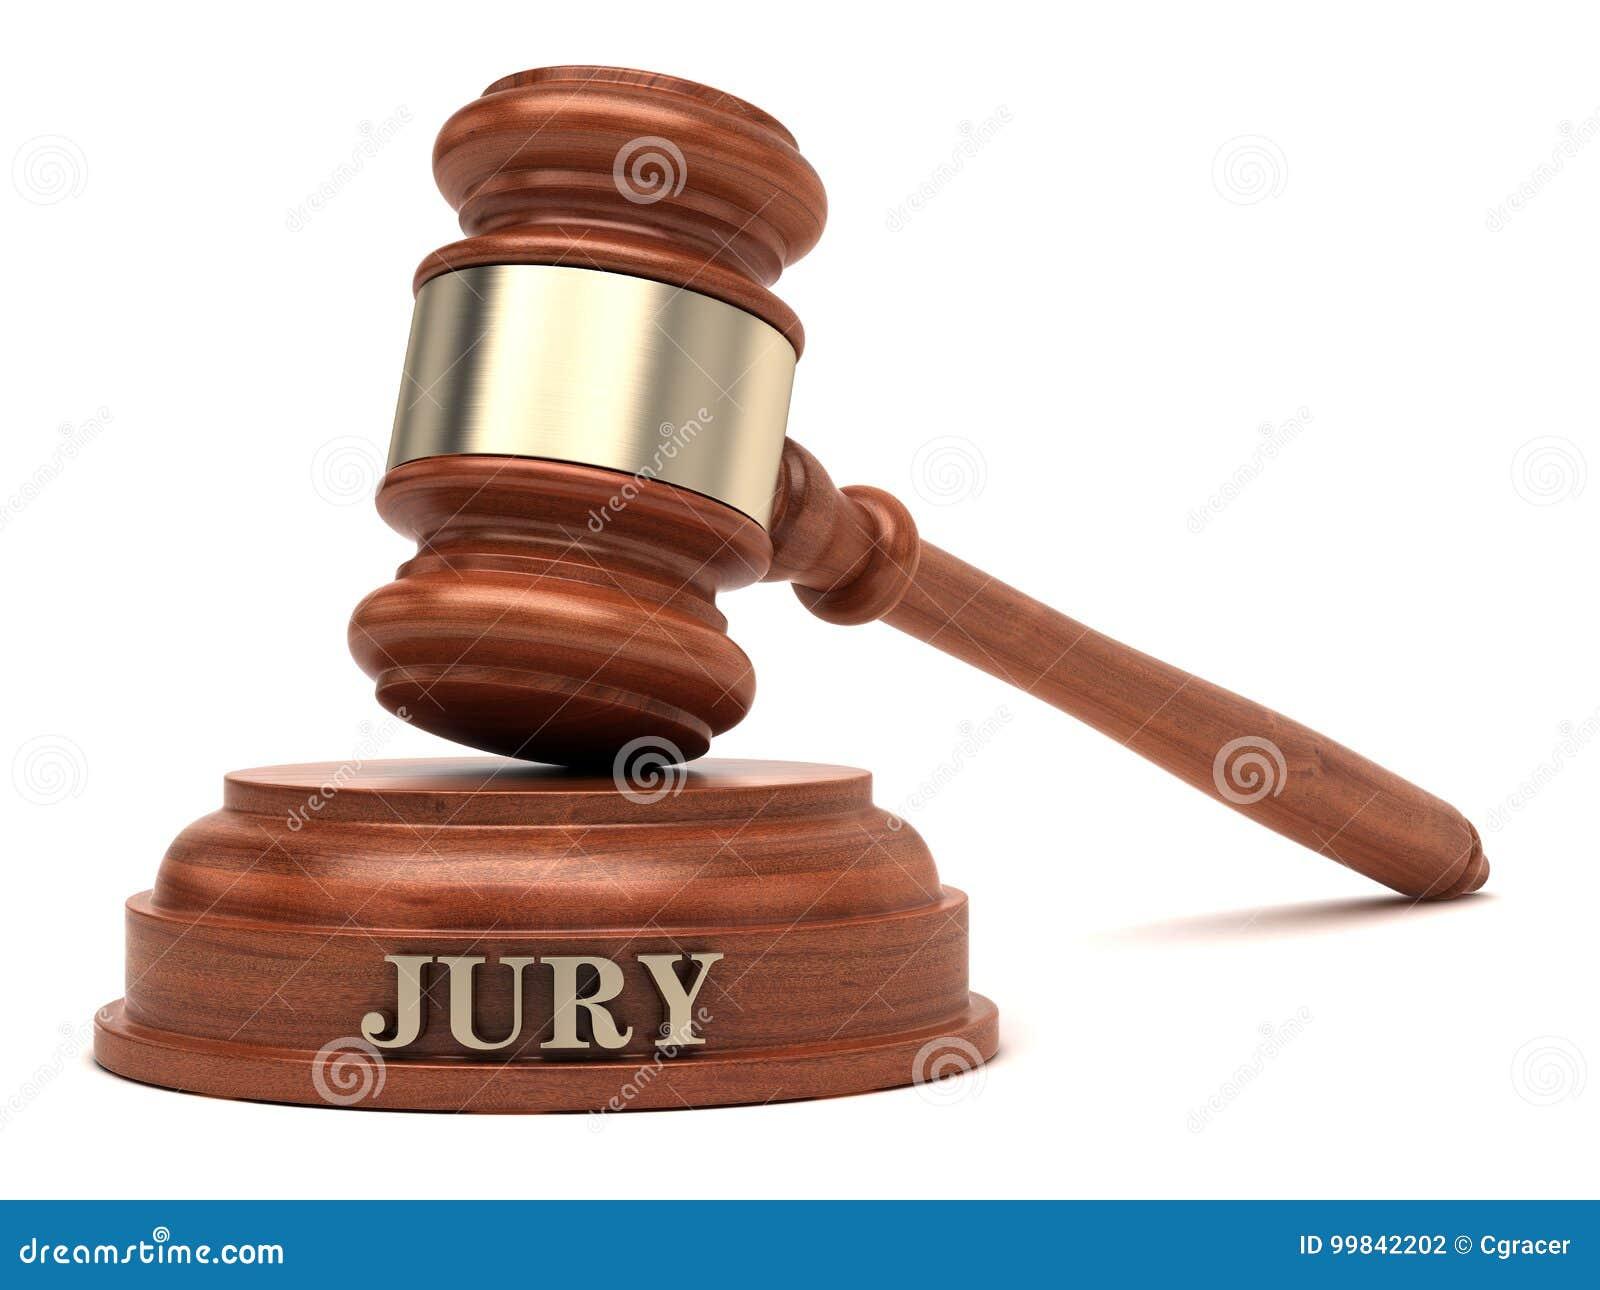 Jury Judge Gavel Court Trial